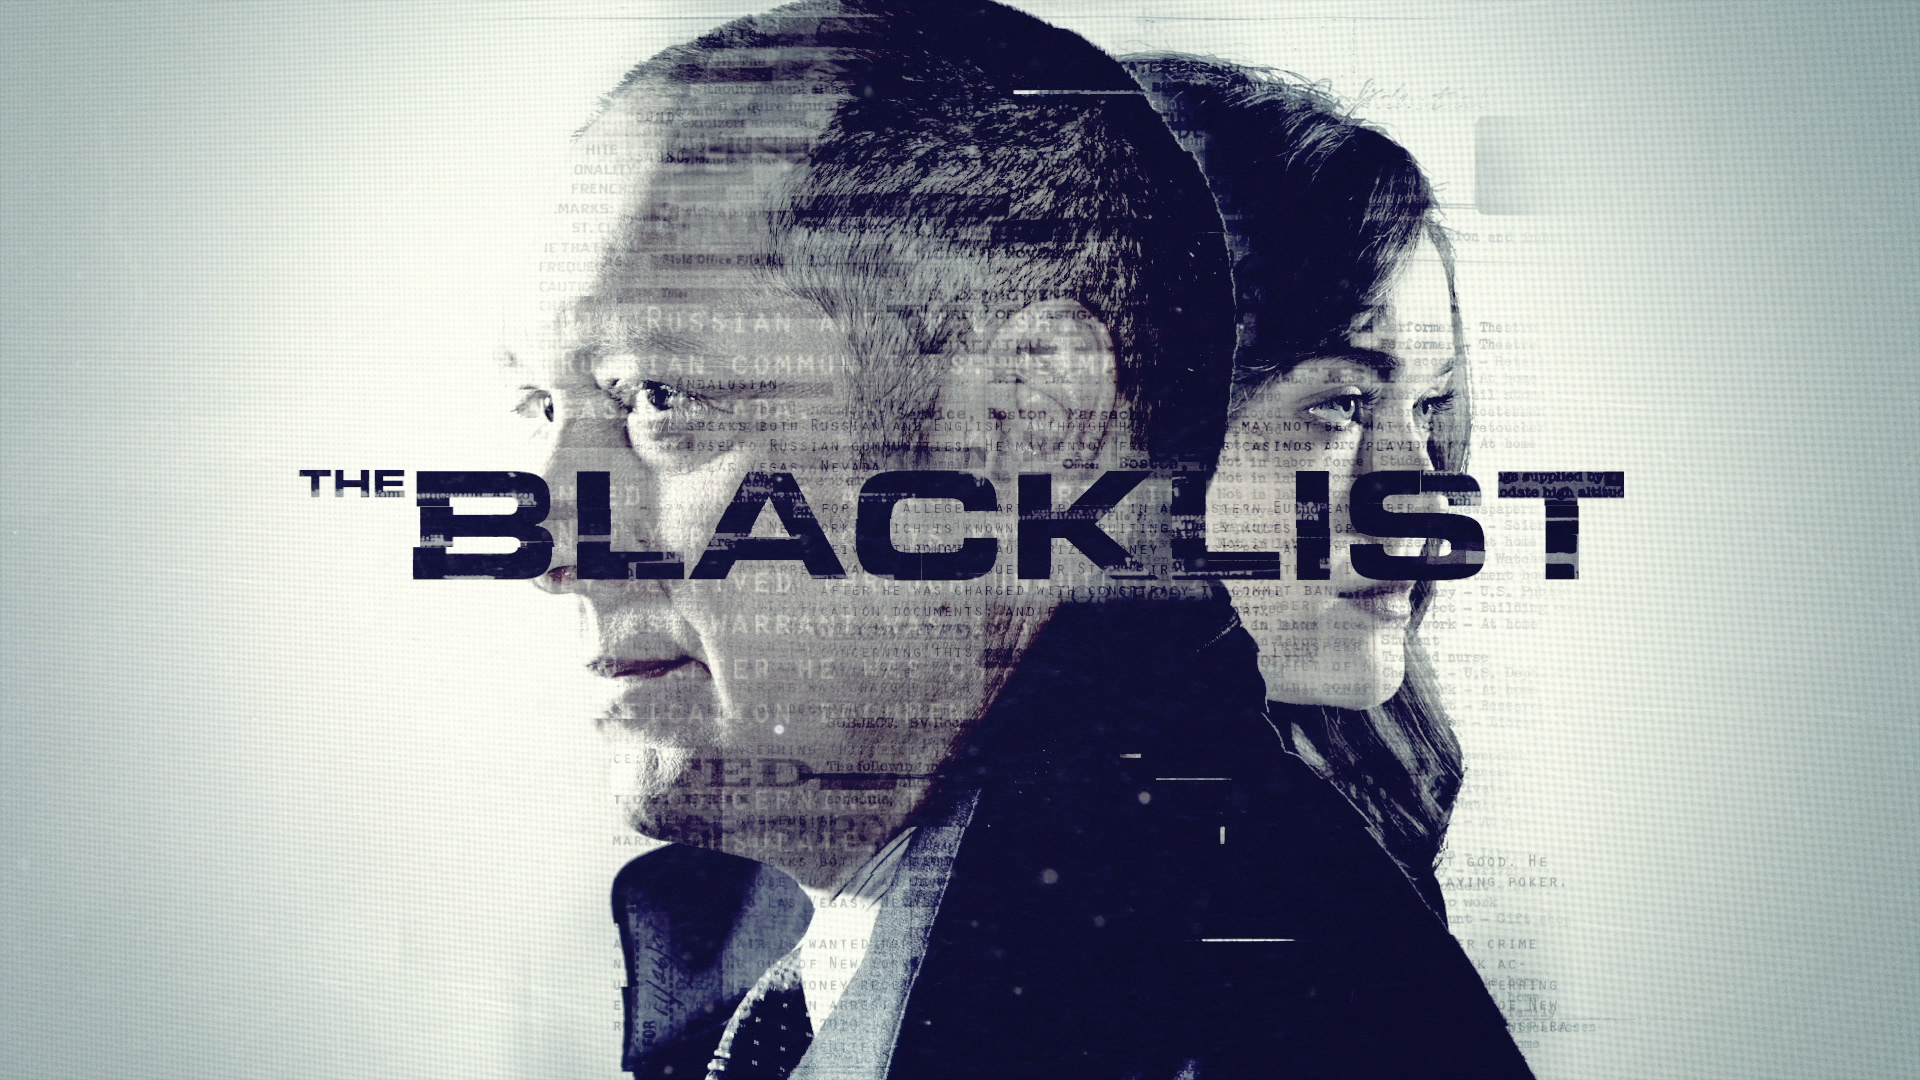 Grant Okita - The Blacklist (Season 1) | On-Air Promotion Brand Pkg